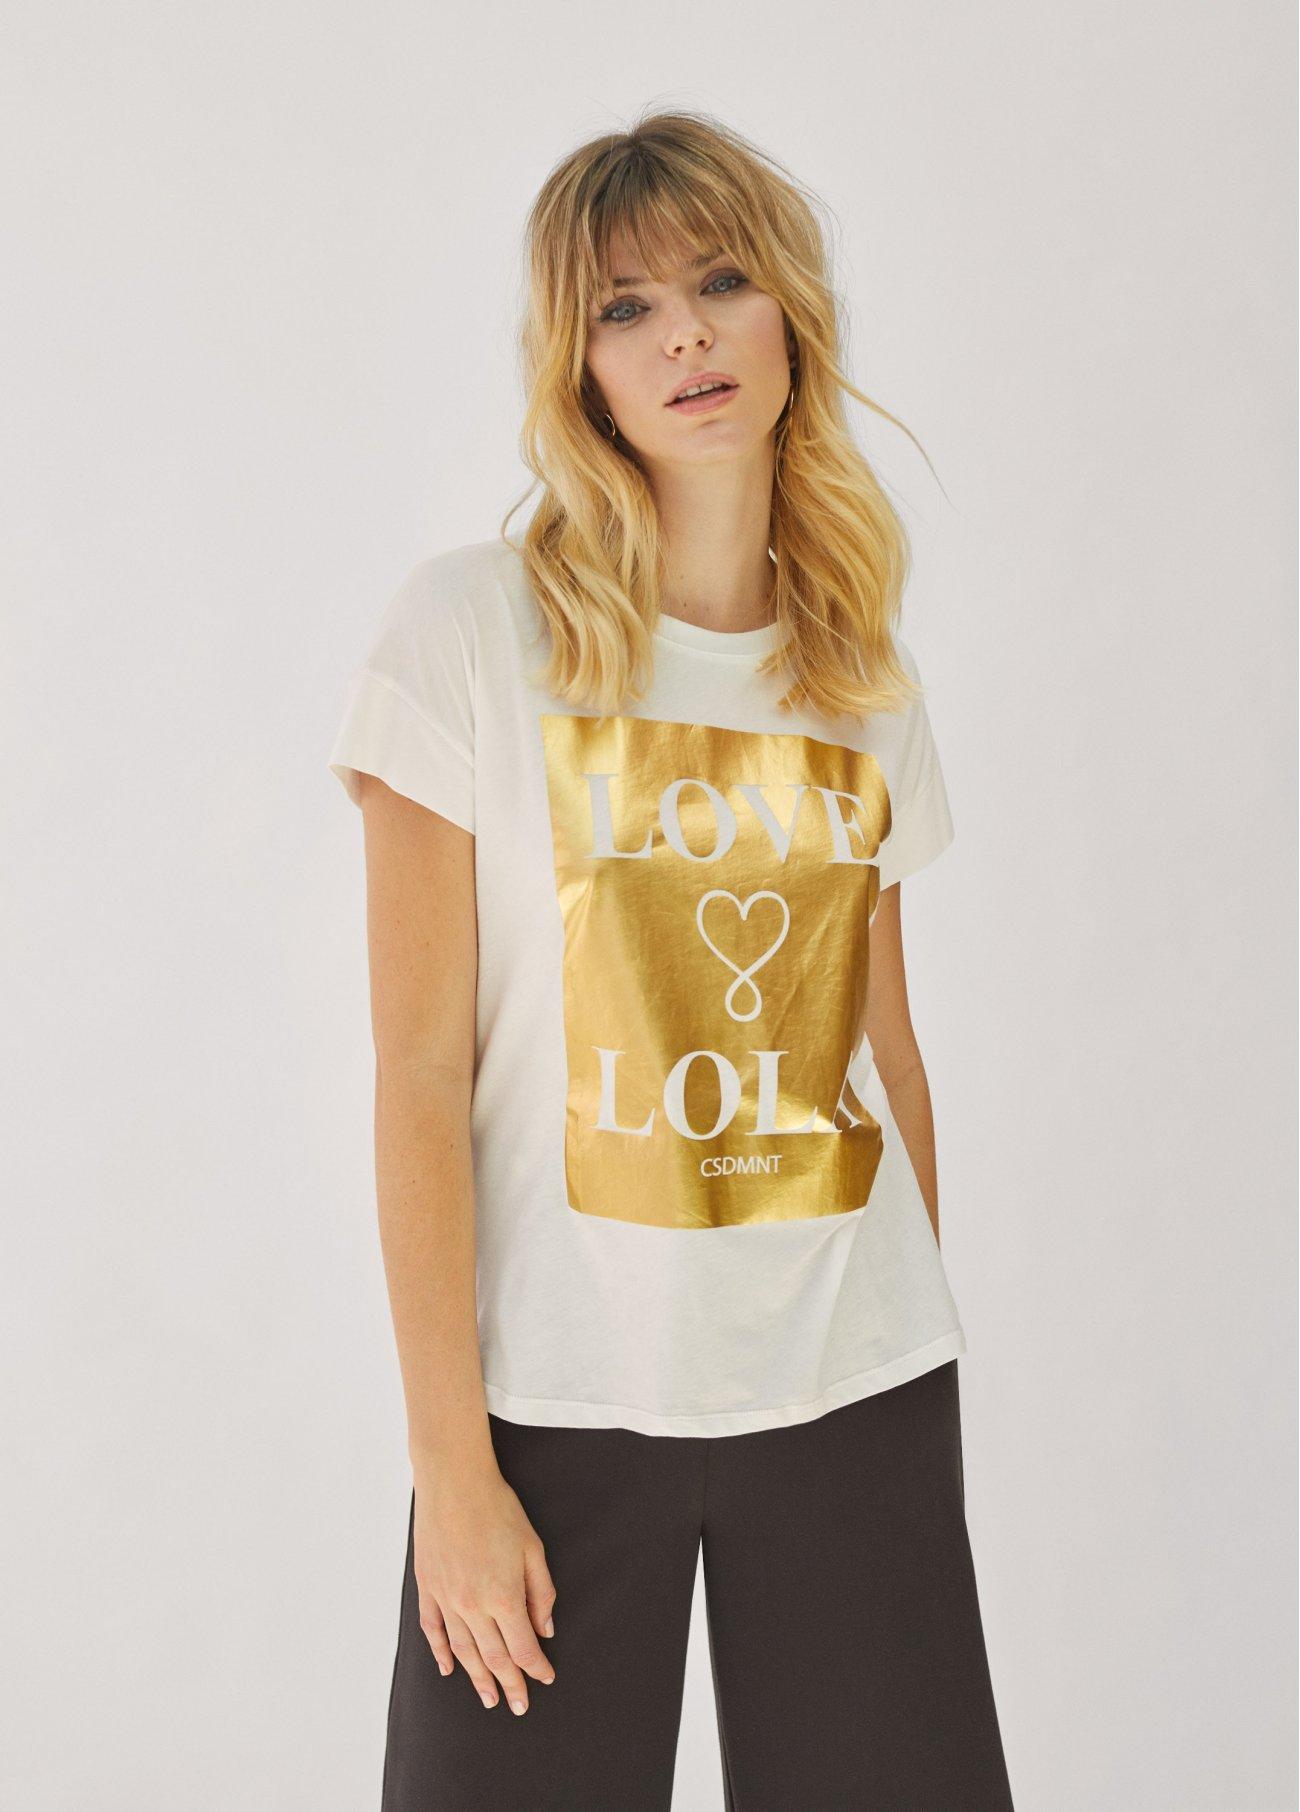 Camiseta Love Lola, rosa, dorado